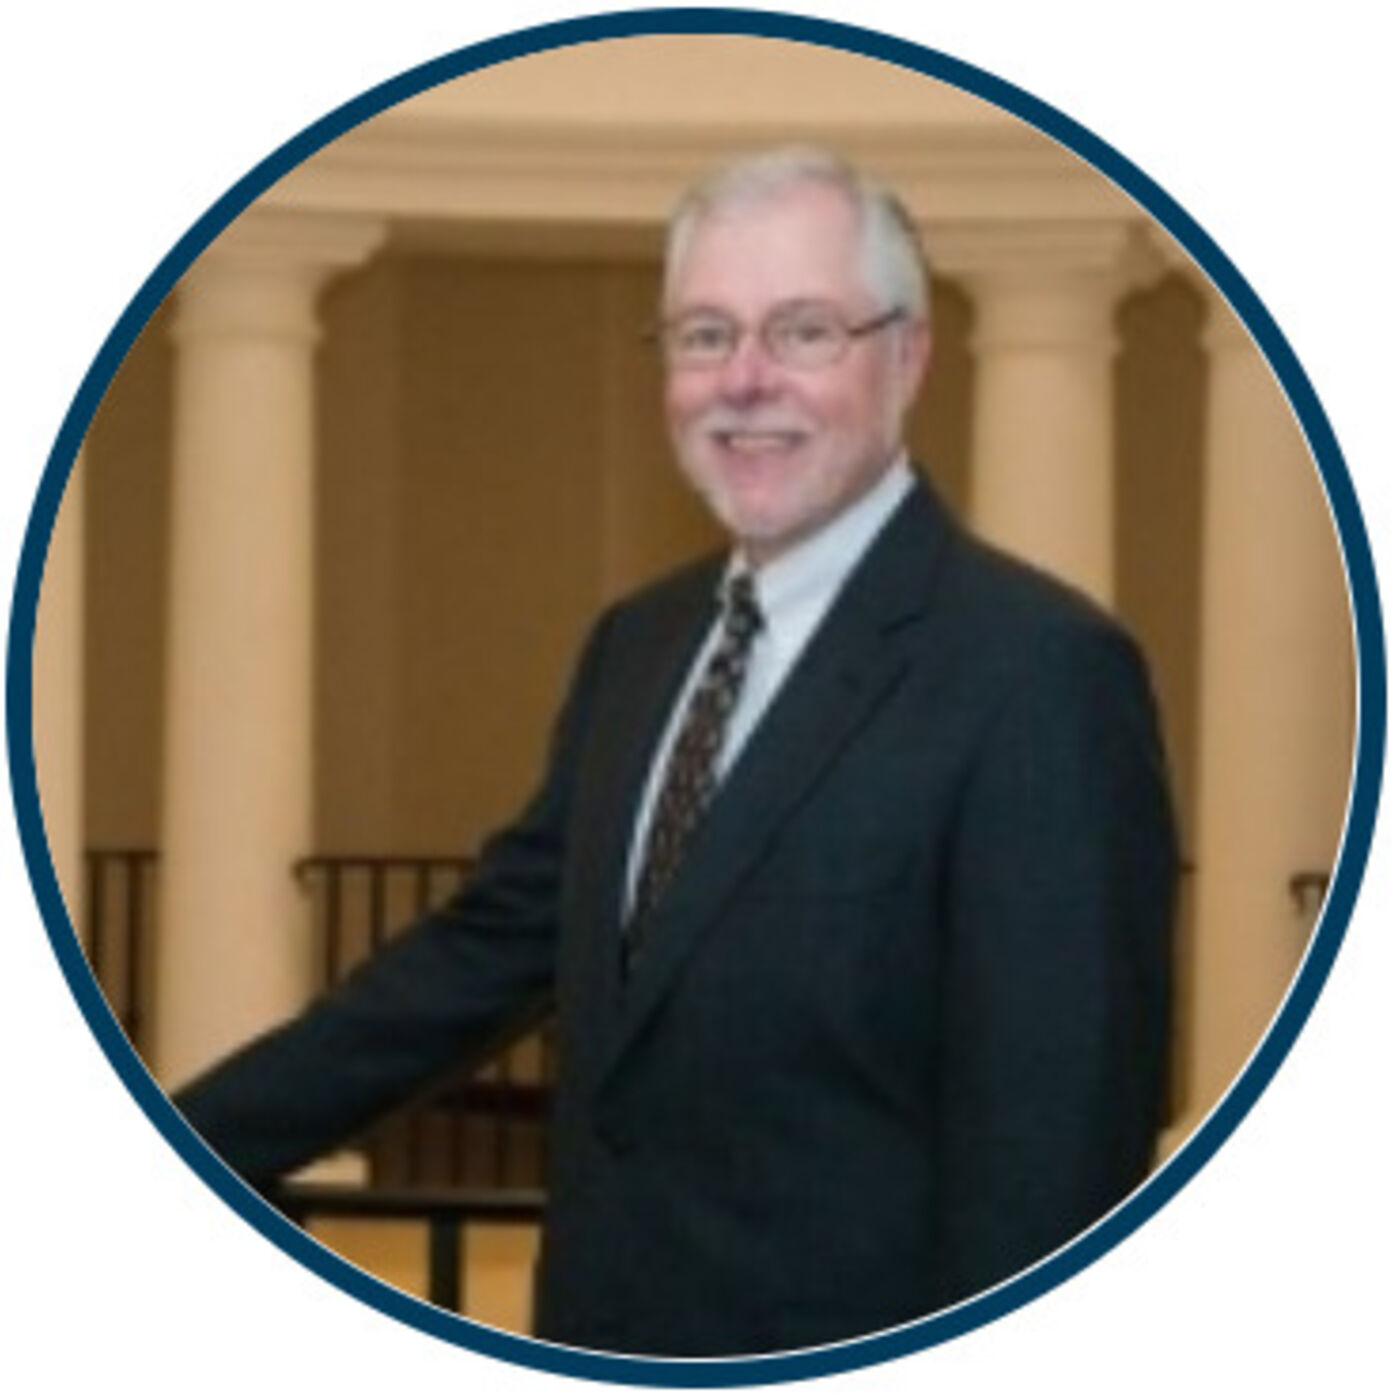 Dr. Mike McLean, Thomas Aquinas College